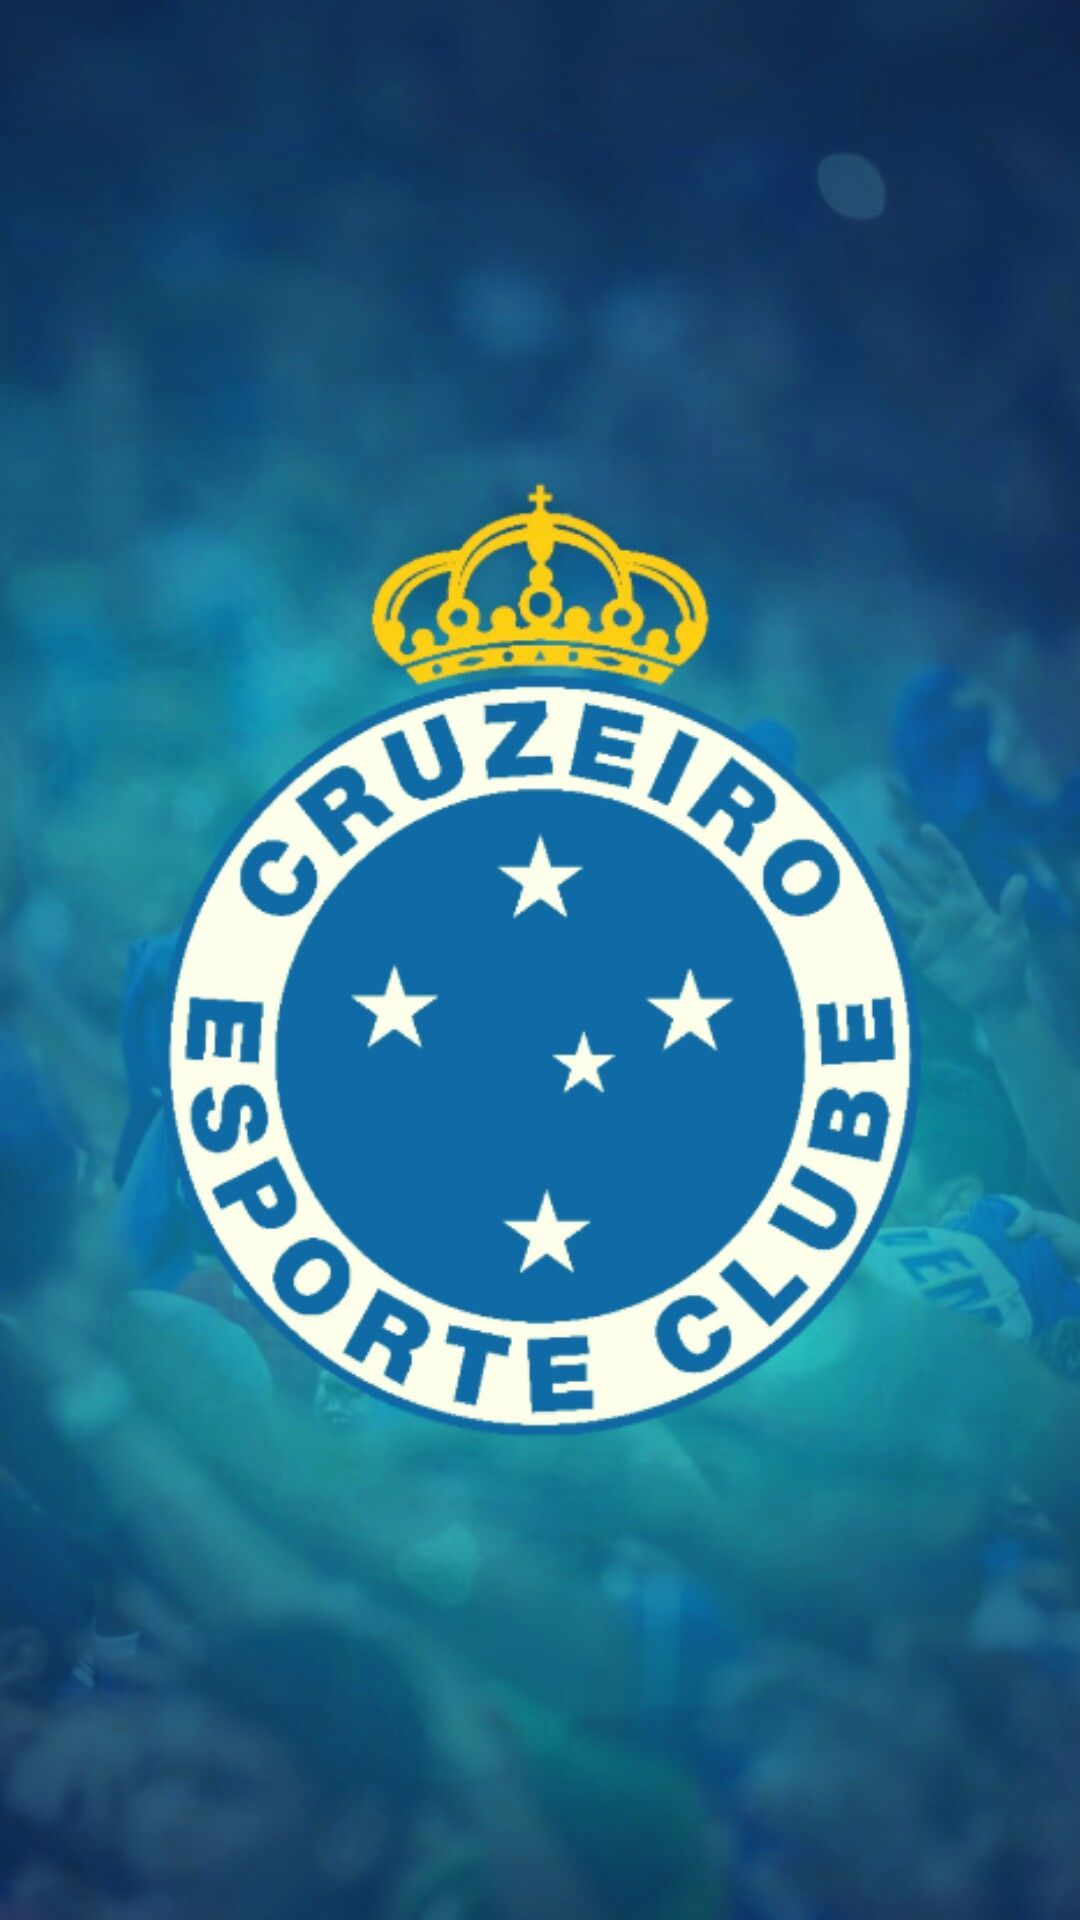 34 Cruzeiro Wallpapers On WallpaperSafari In 2020